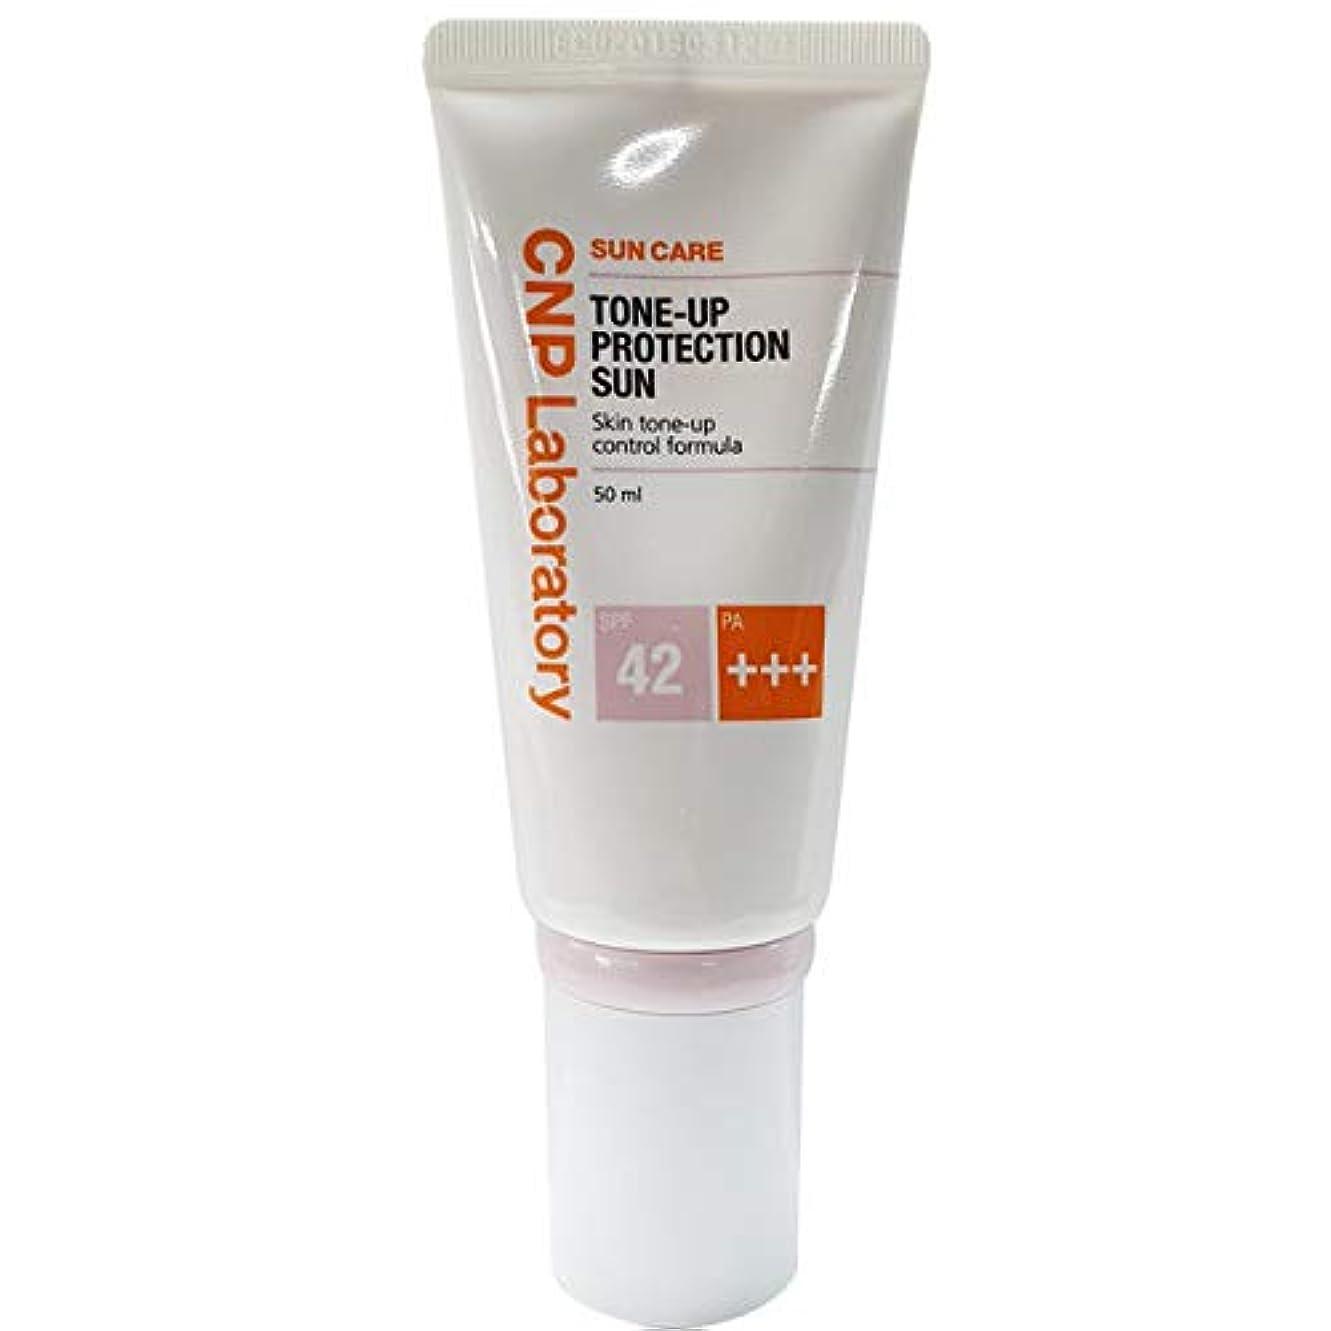 CNP チャアンドパク トンオププロテクションサン?クリーム紫外線遮断剤 50ml (SPF42 / PA+++)、2019 NEW, CNP Tone-up Protection Sun Cream/韓国日焼け止め